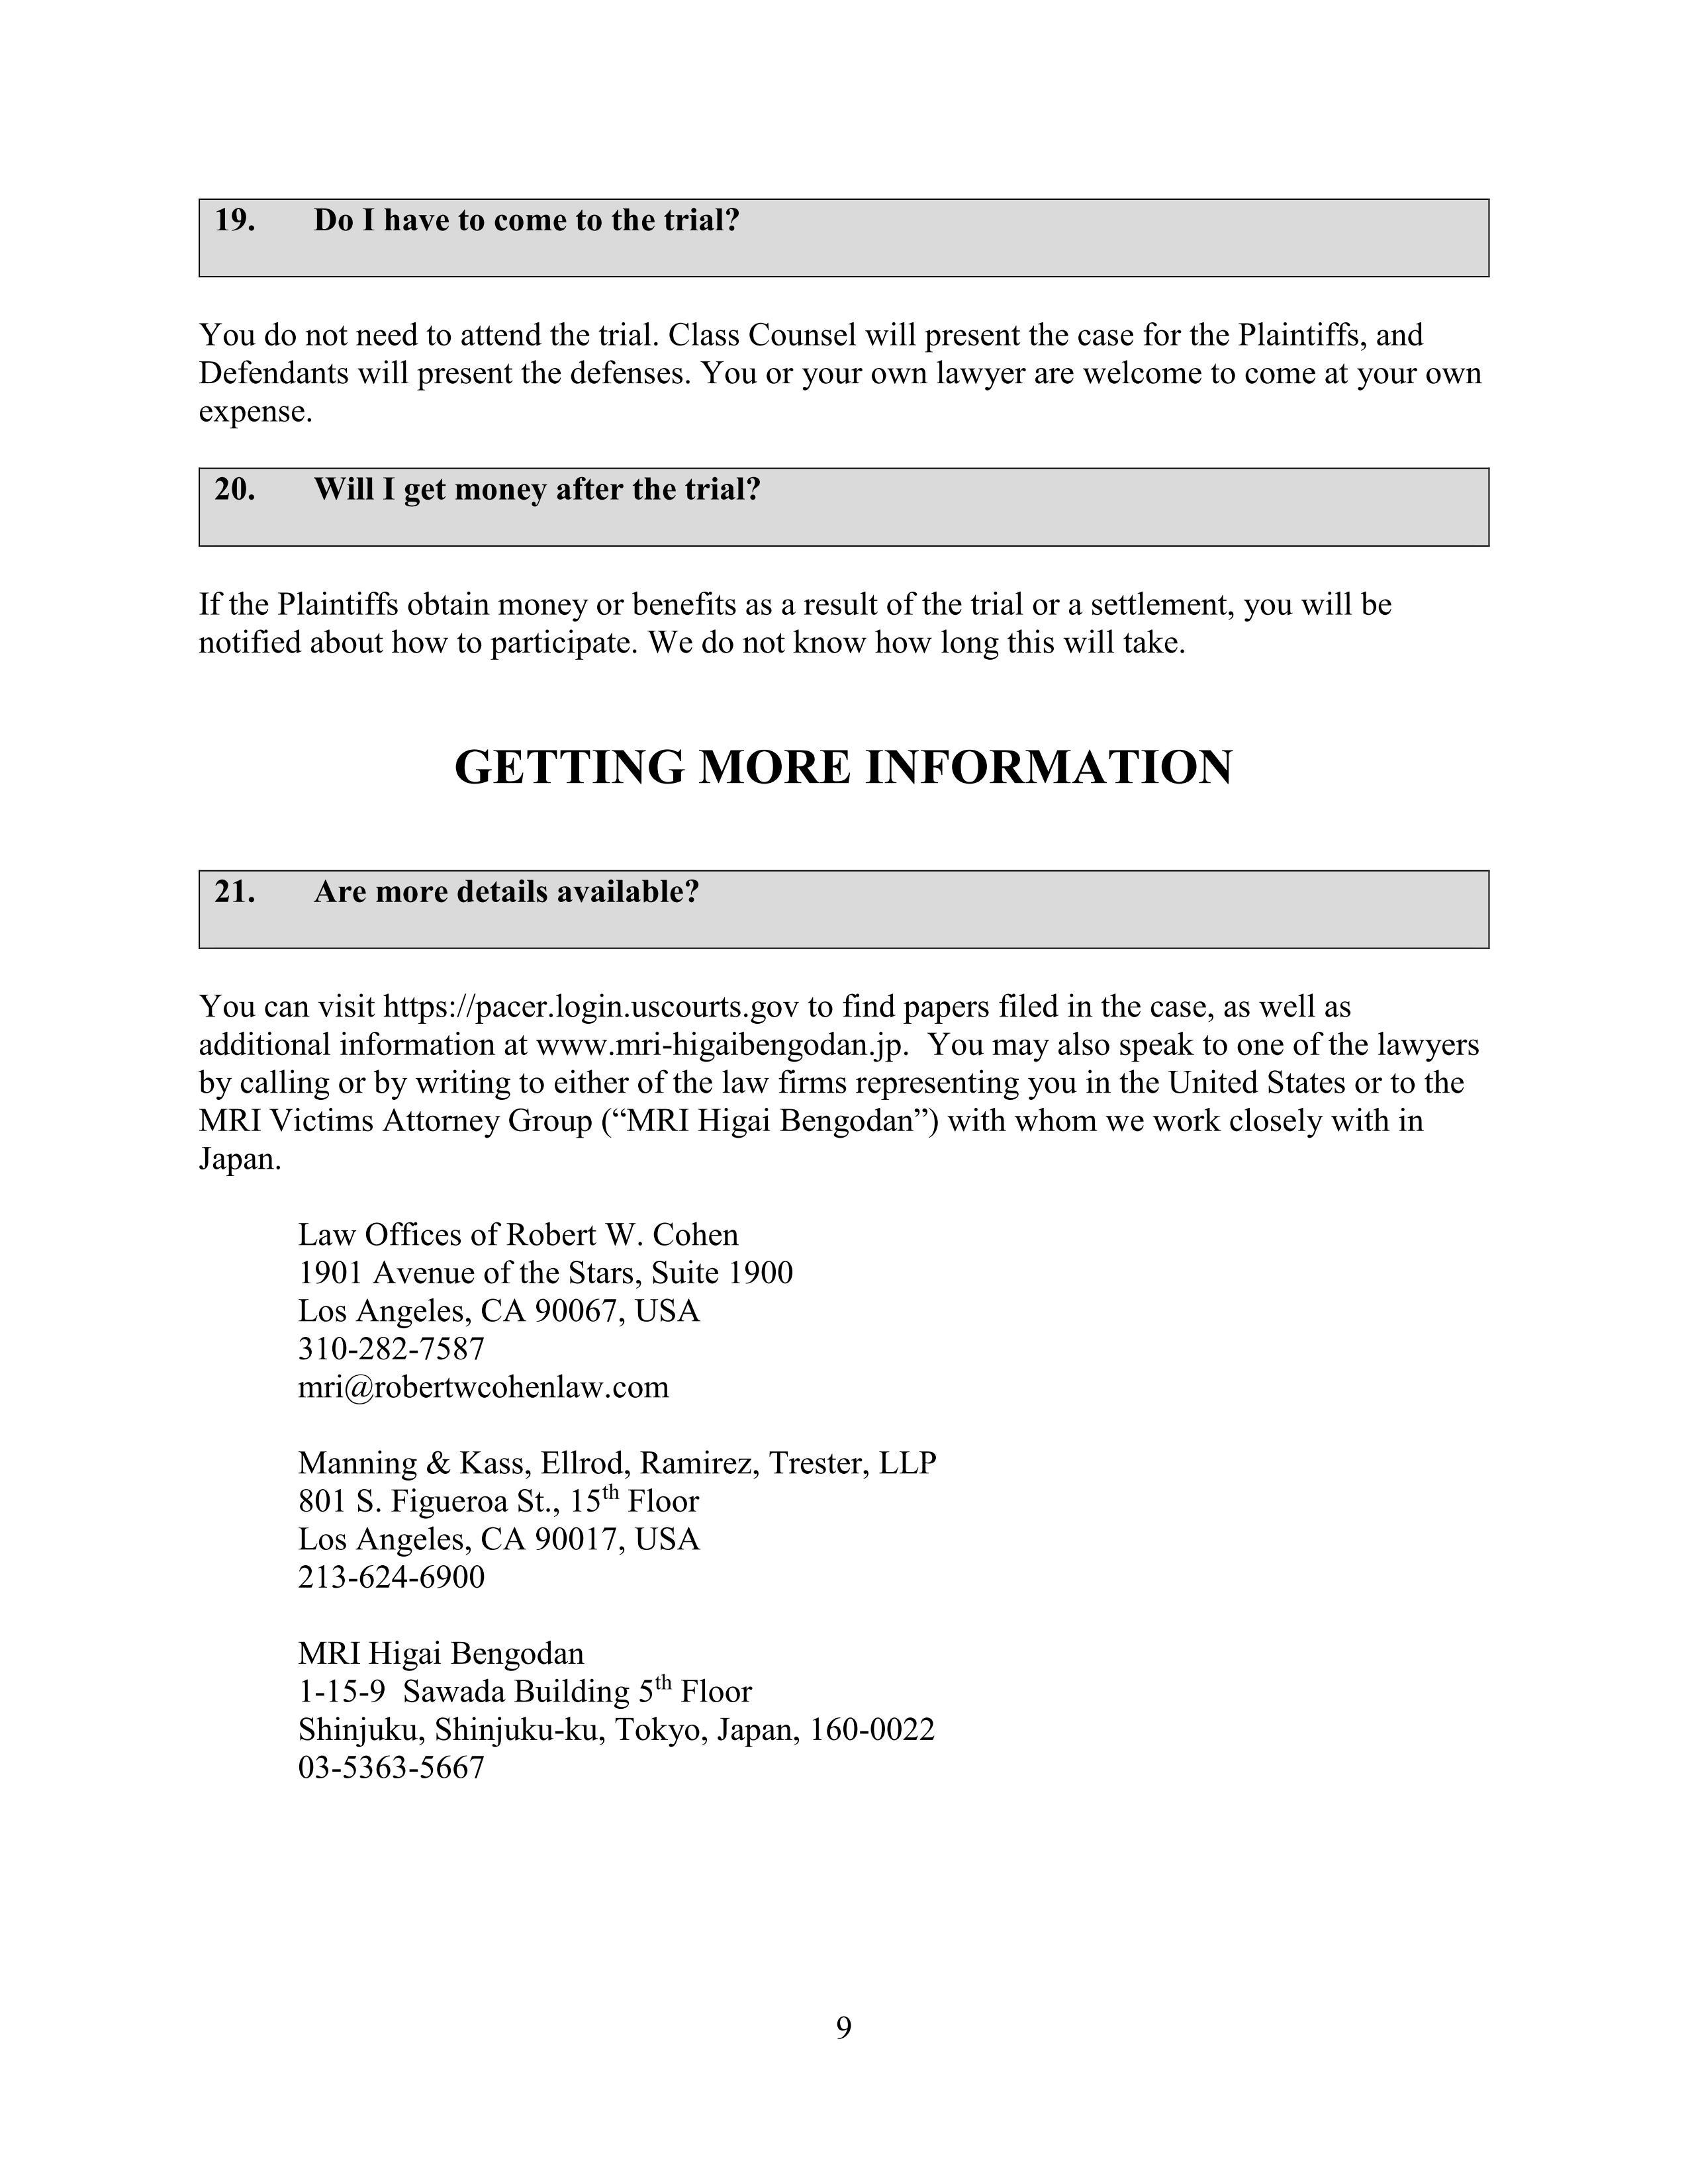 MRI Class Cert Notice_09